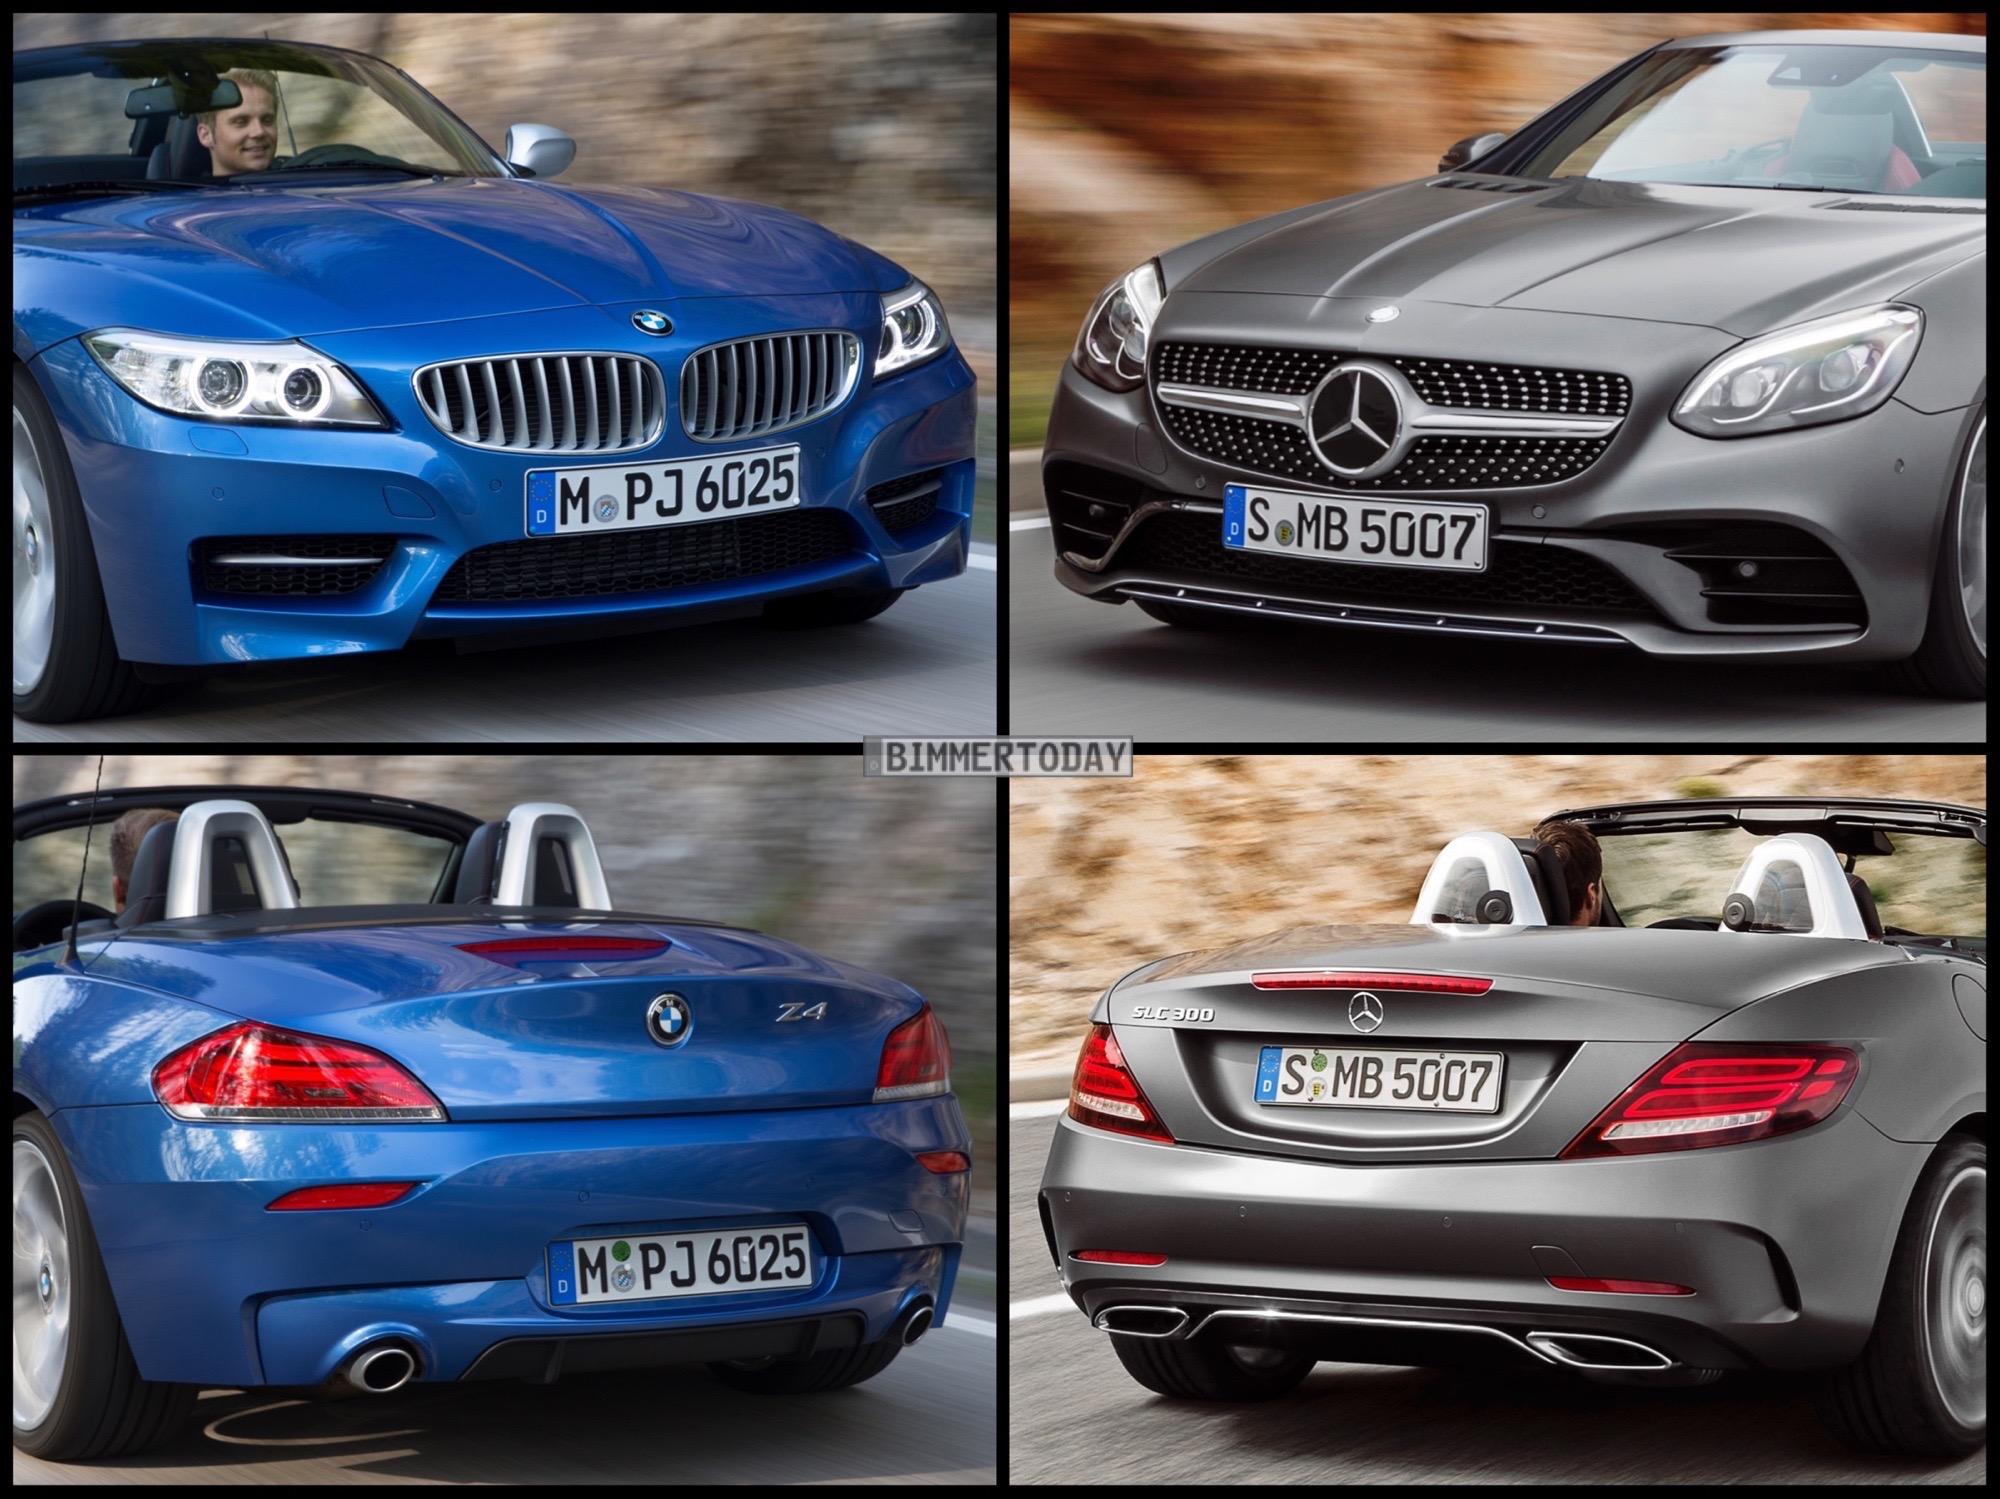 Bild Vergleich Mercedes SLC Roadster vs BMW Z4 E89